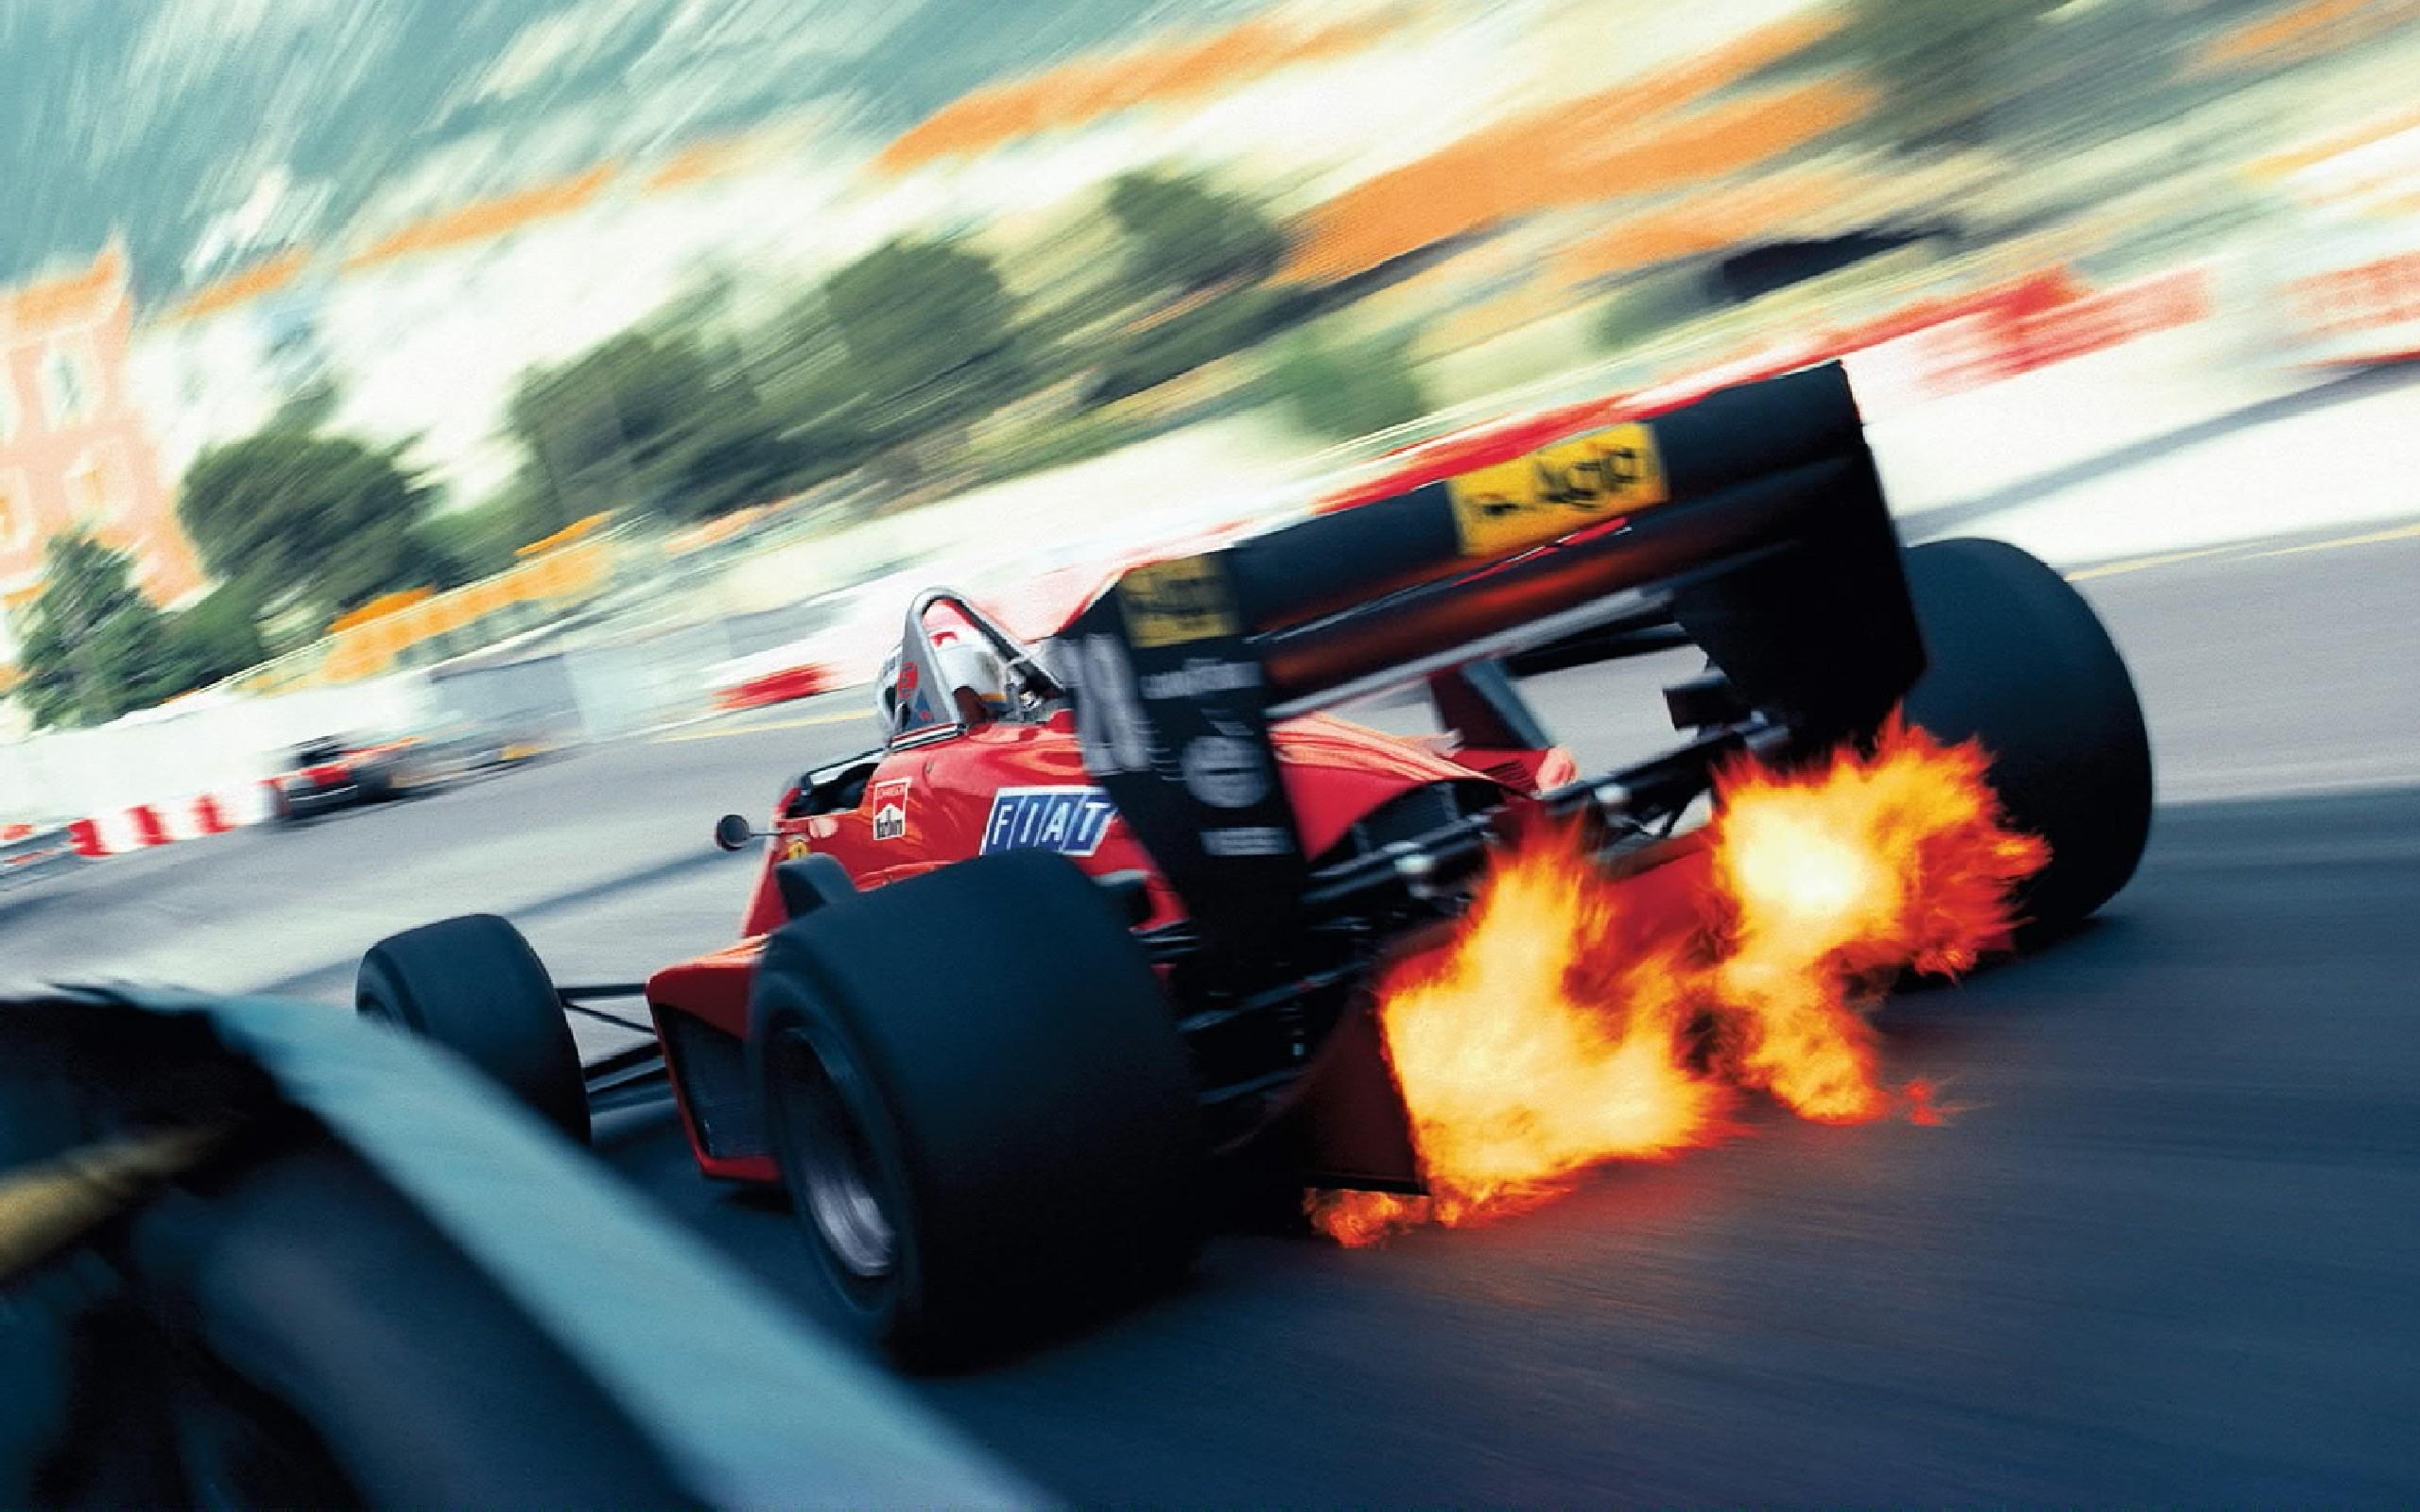 HD F1 Racing Wallpapers and Photos | HD Cars Wallpapers | feelgrafix.com |  Pinterest | F1 racing, Wallpaper and Car photos